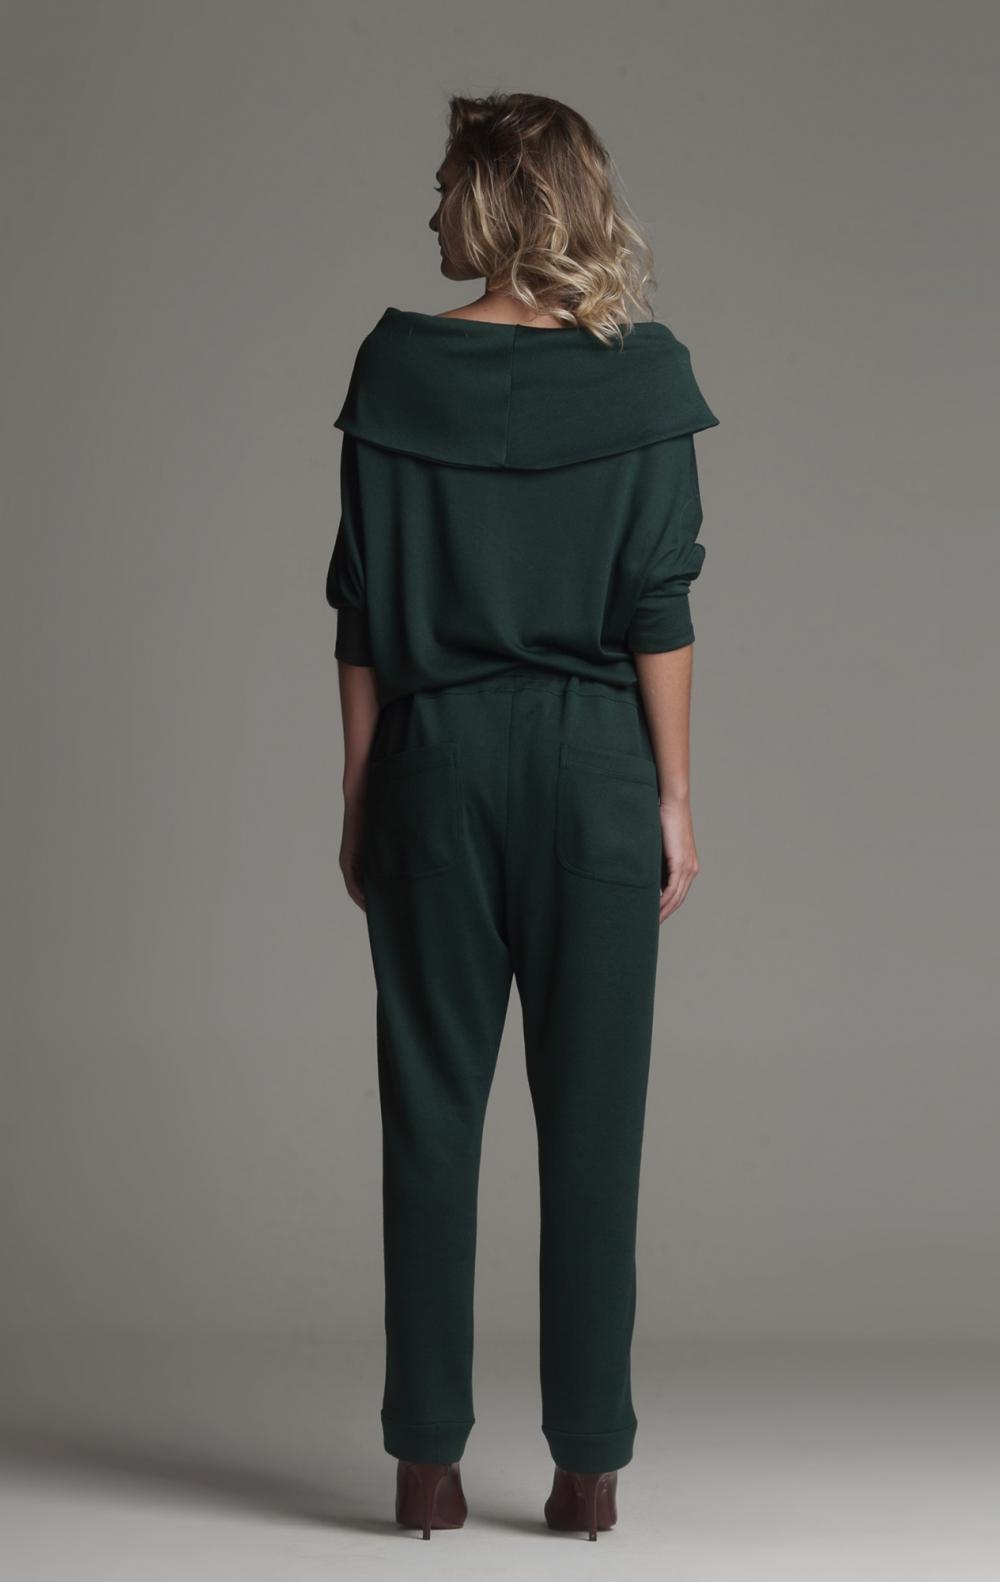 Blusa Malha Ombro a Ombro Verde - Foto 2